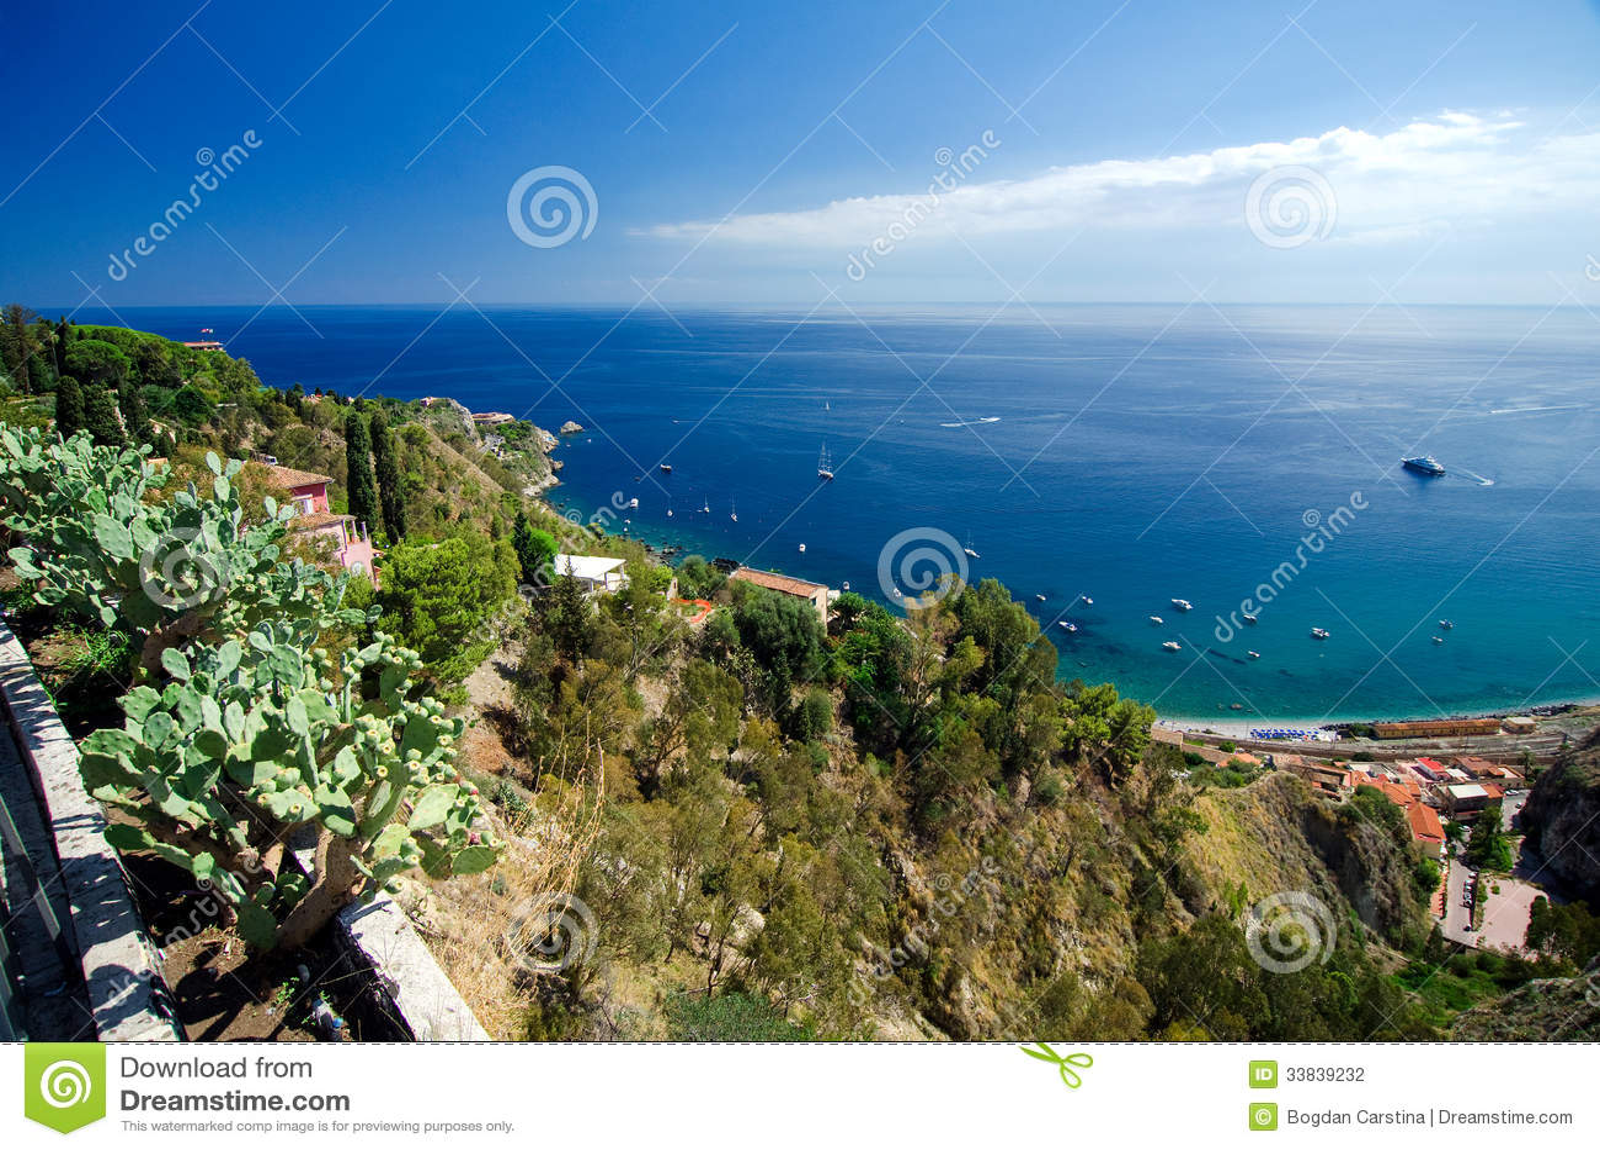 Taormina giardini naxos bucht mit dem meer und dem Ätna und